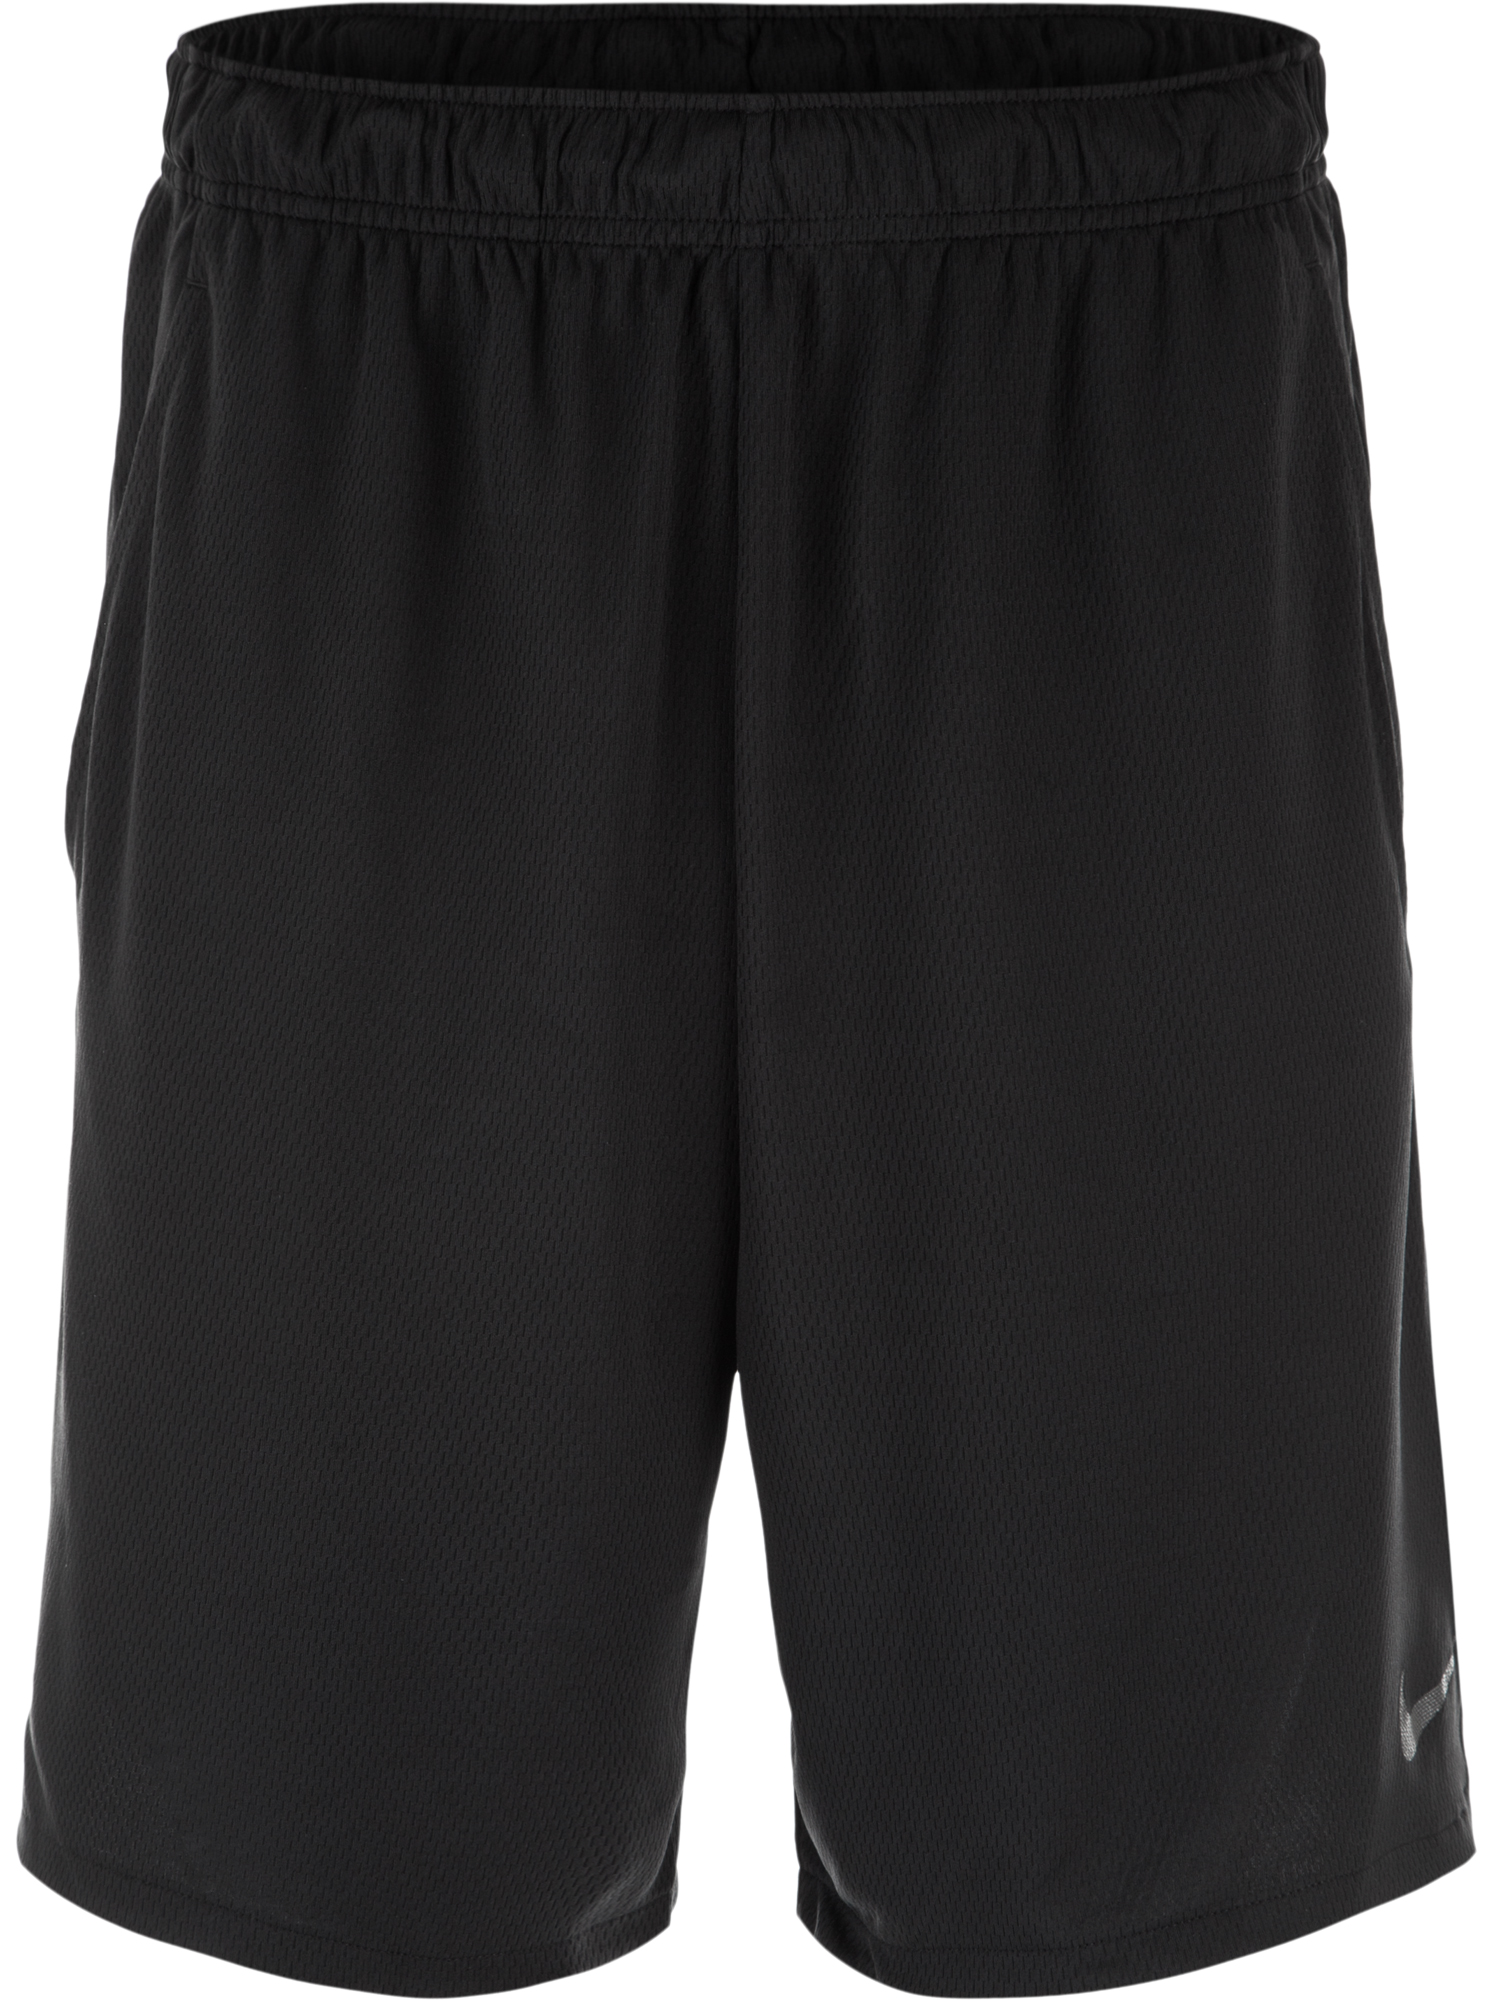 Nike Шорты мужские Nike Dry шорты мужские nike court dry nike